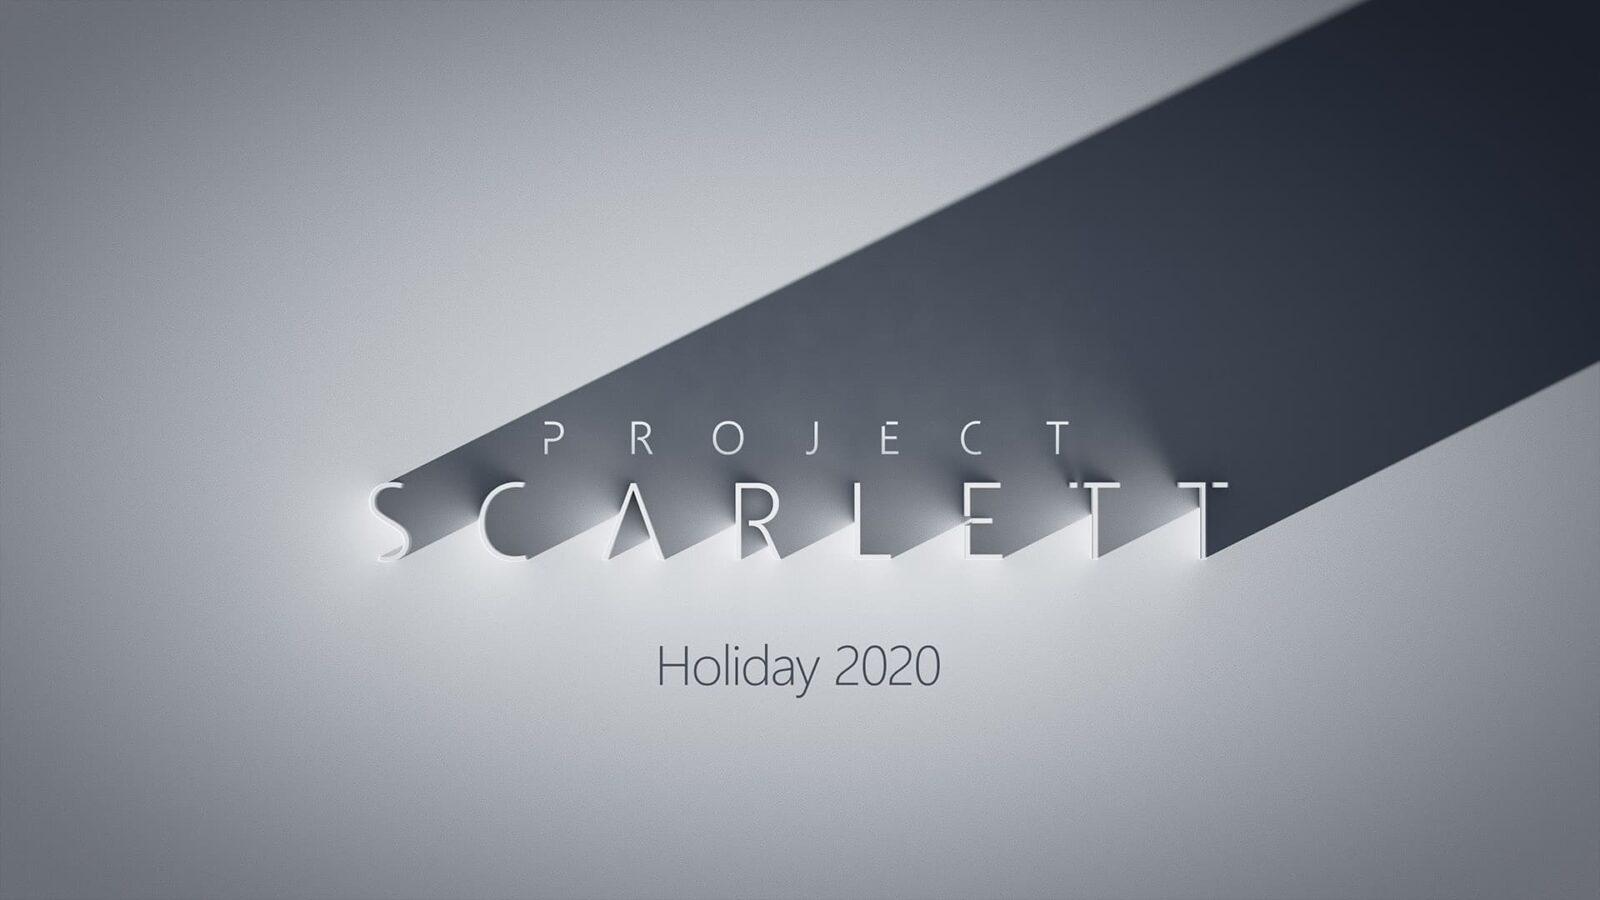 xbox scarlett logo